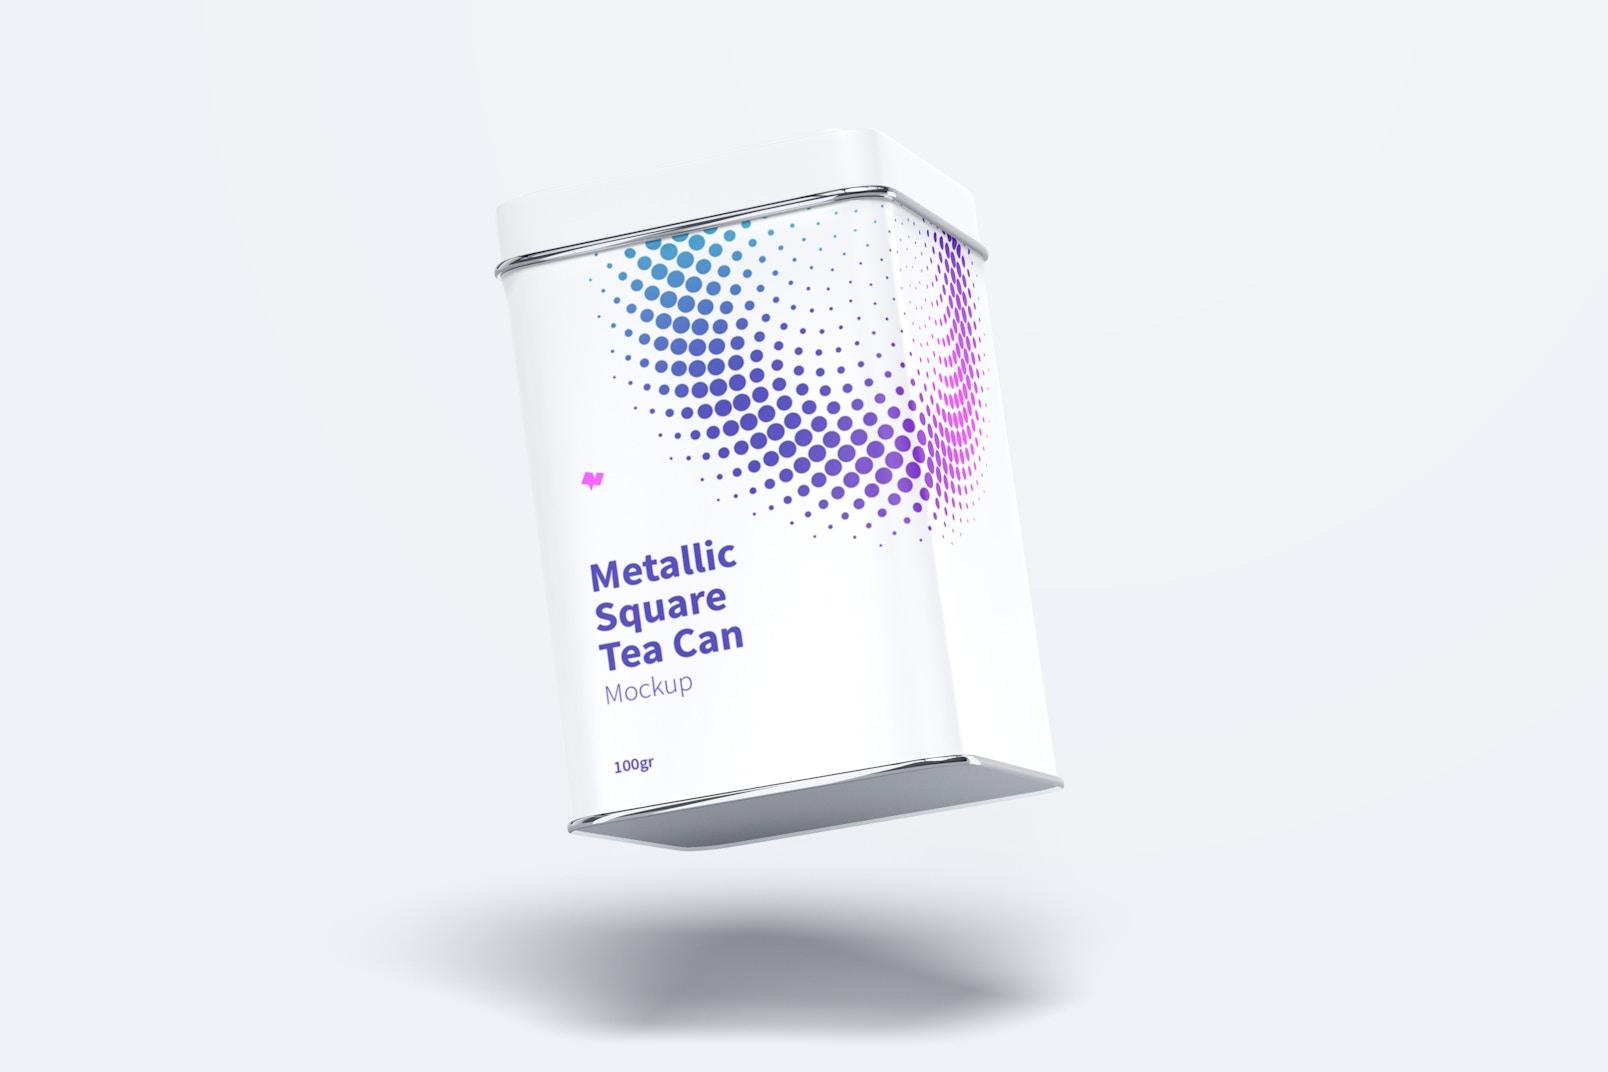 Metallic Square Tea Tin Can Mockup, Floating